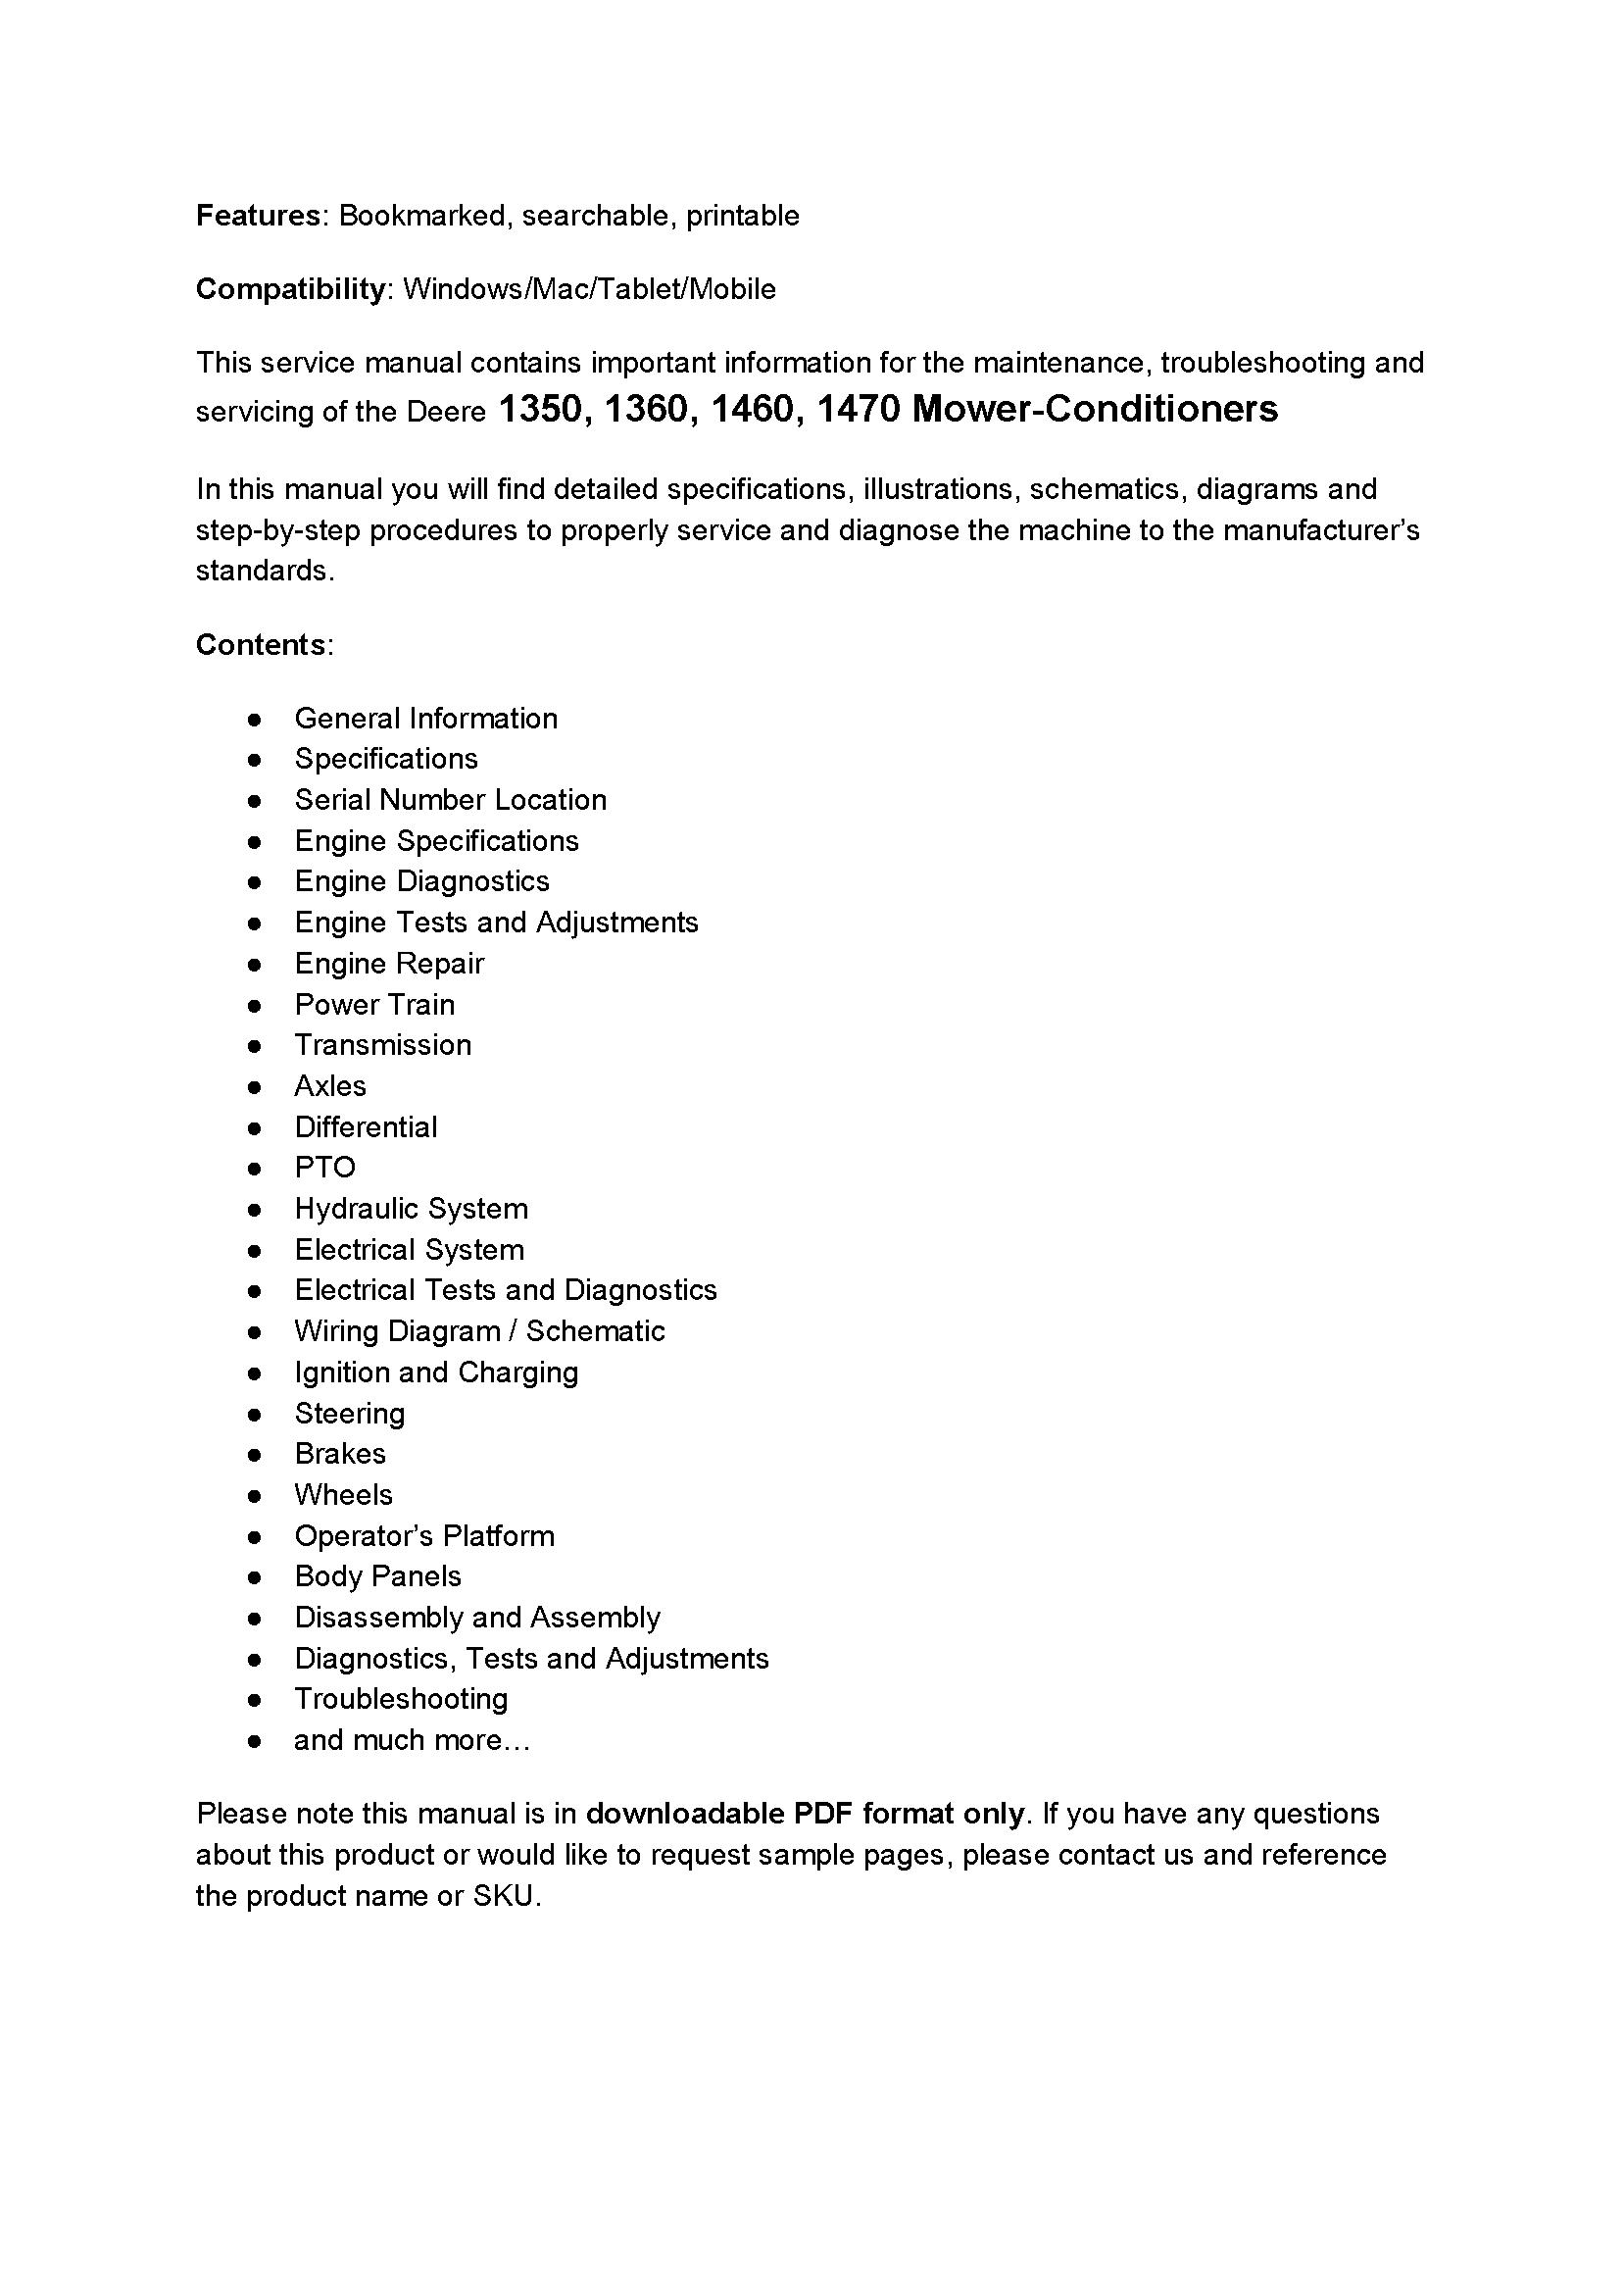 John Deere 1360 manual